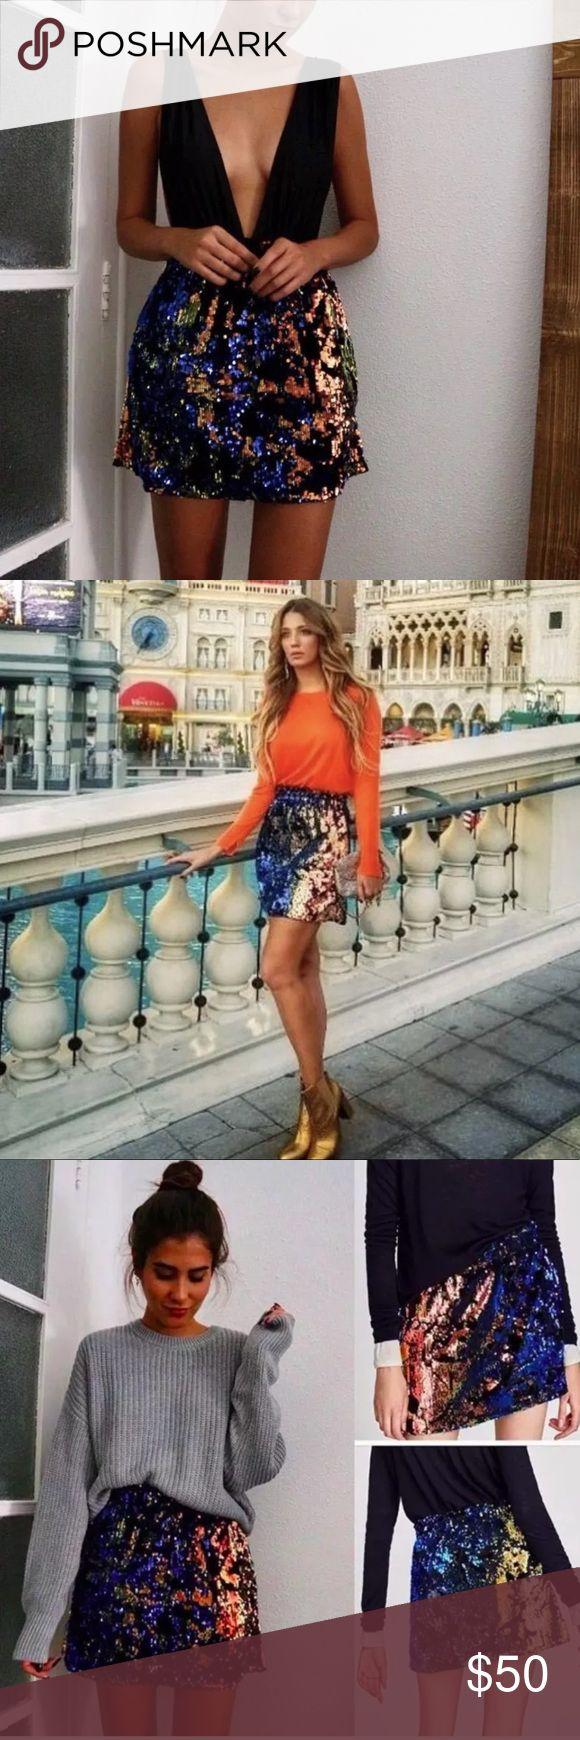 ZARA MULTICOLORED SEQUIN MINI SKIRT Brand new with tags. Zara size small. A multicolored sequin mini skirt. Zara Skirts Mini